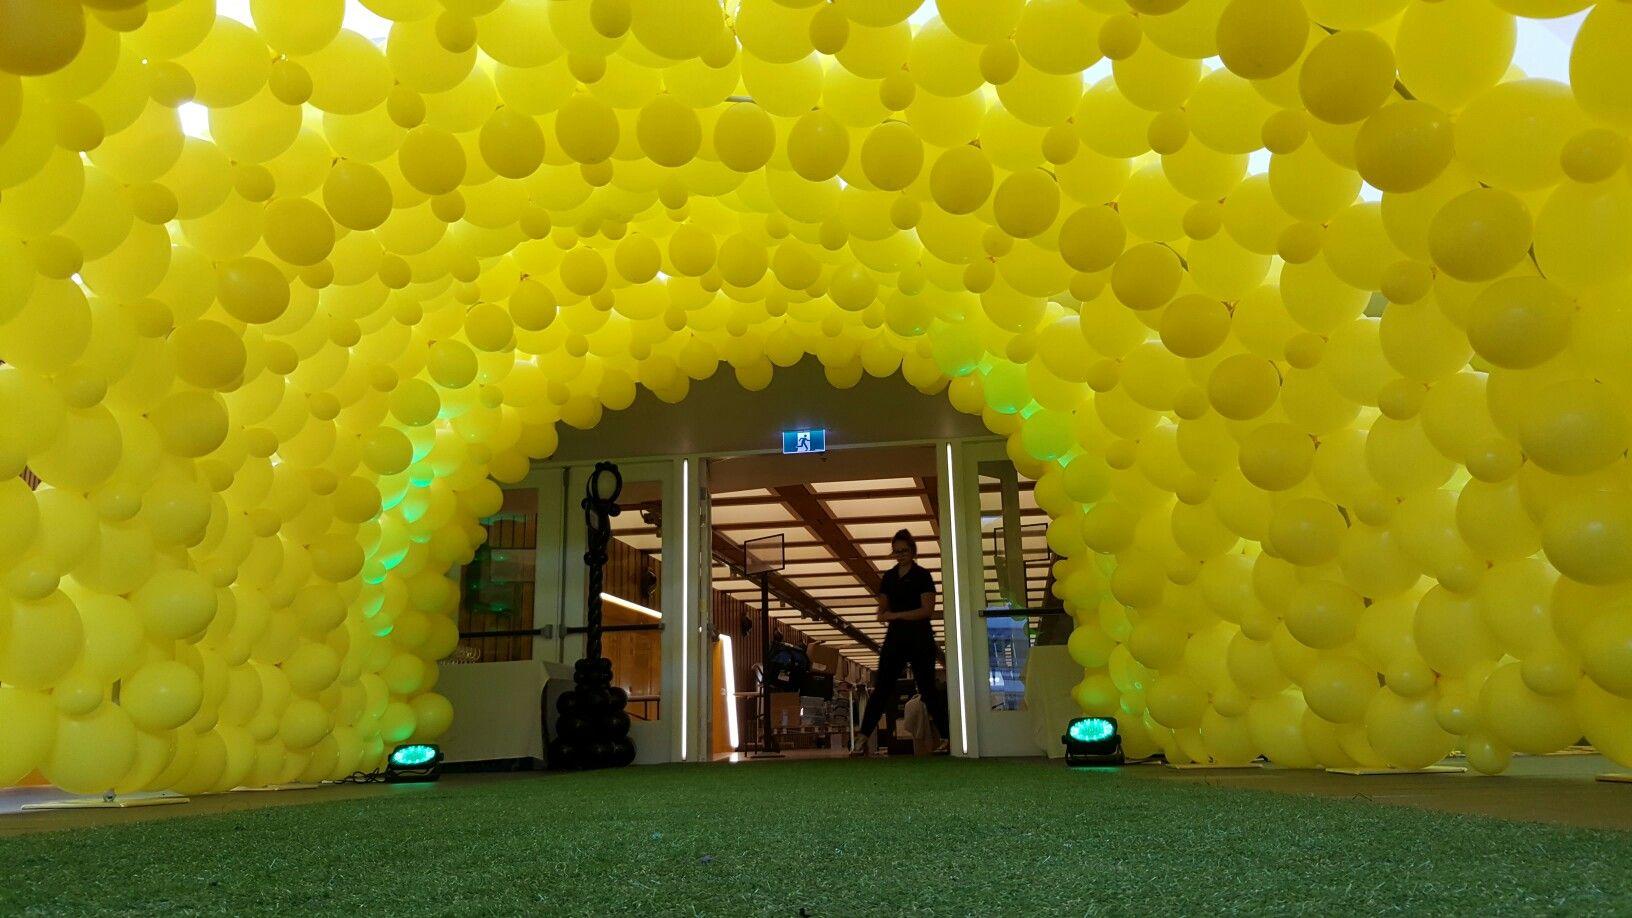 Giant 8m long balloon tunnel. www.balloons.com.au | balloons ...